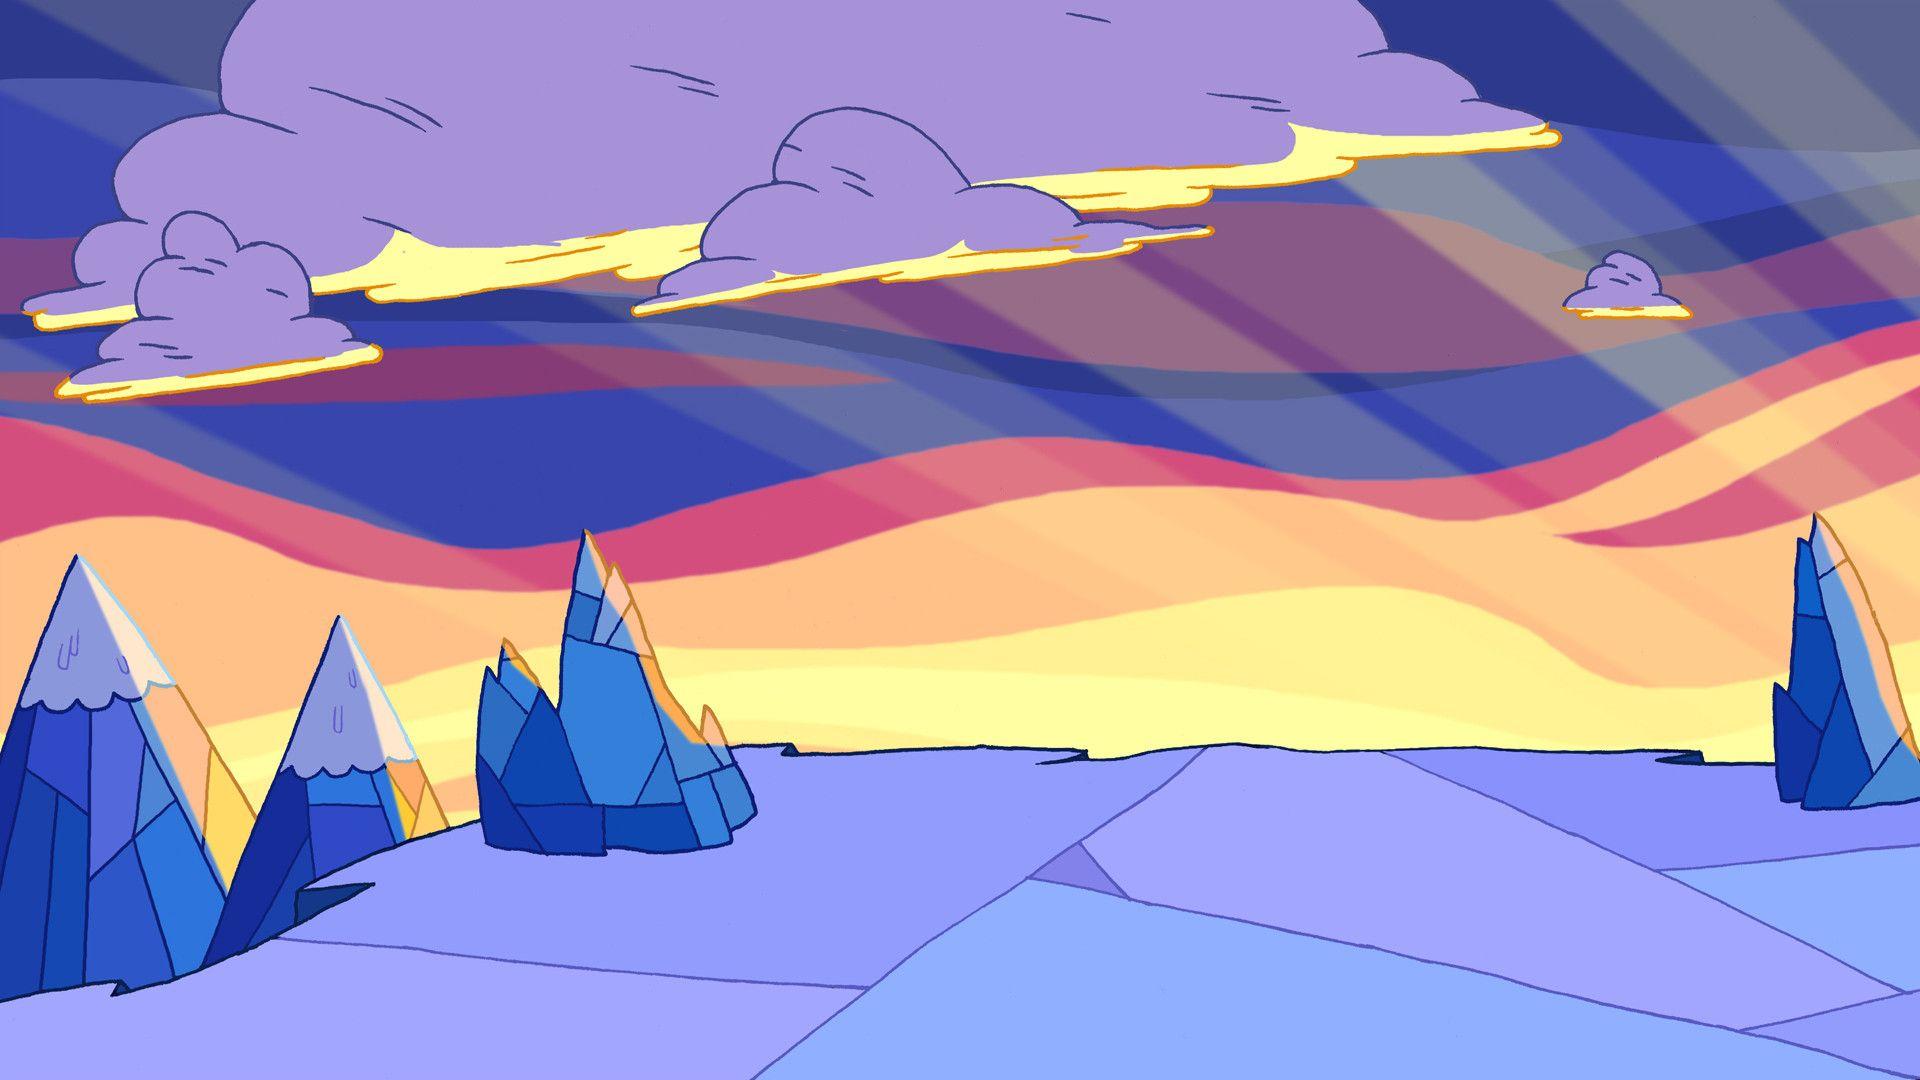 Adventure Time Ice Kingdom Adventure Time Wallpaper Adventure Time Background Adventure Time Ending